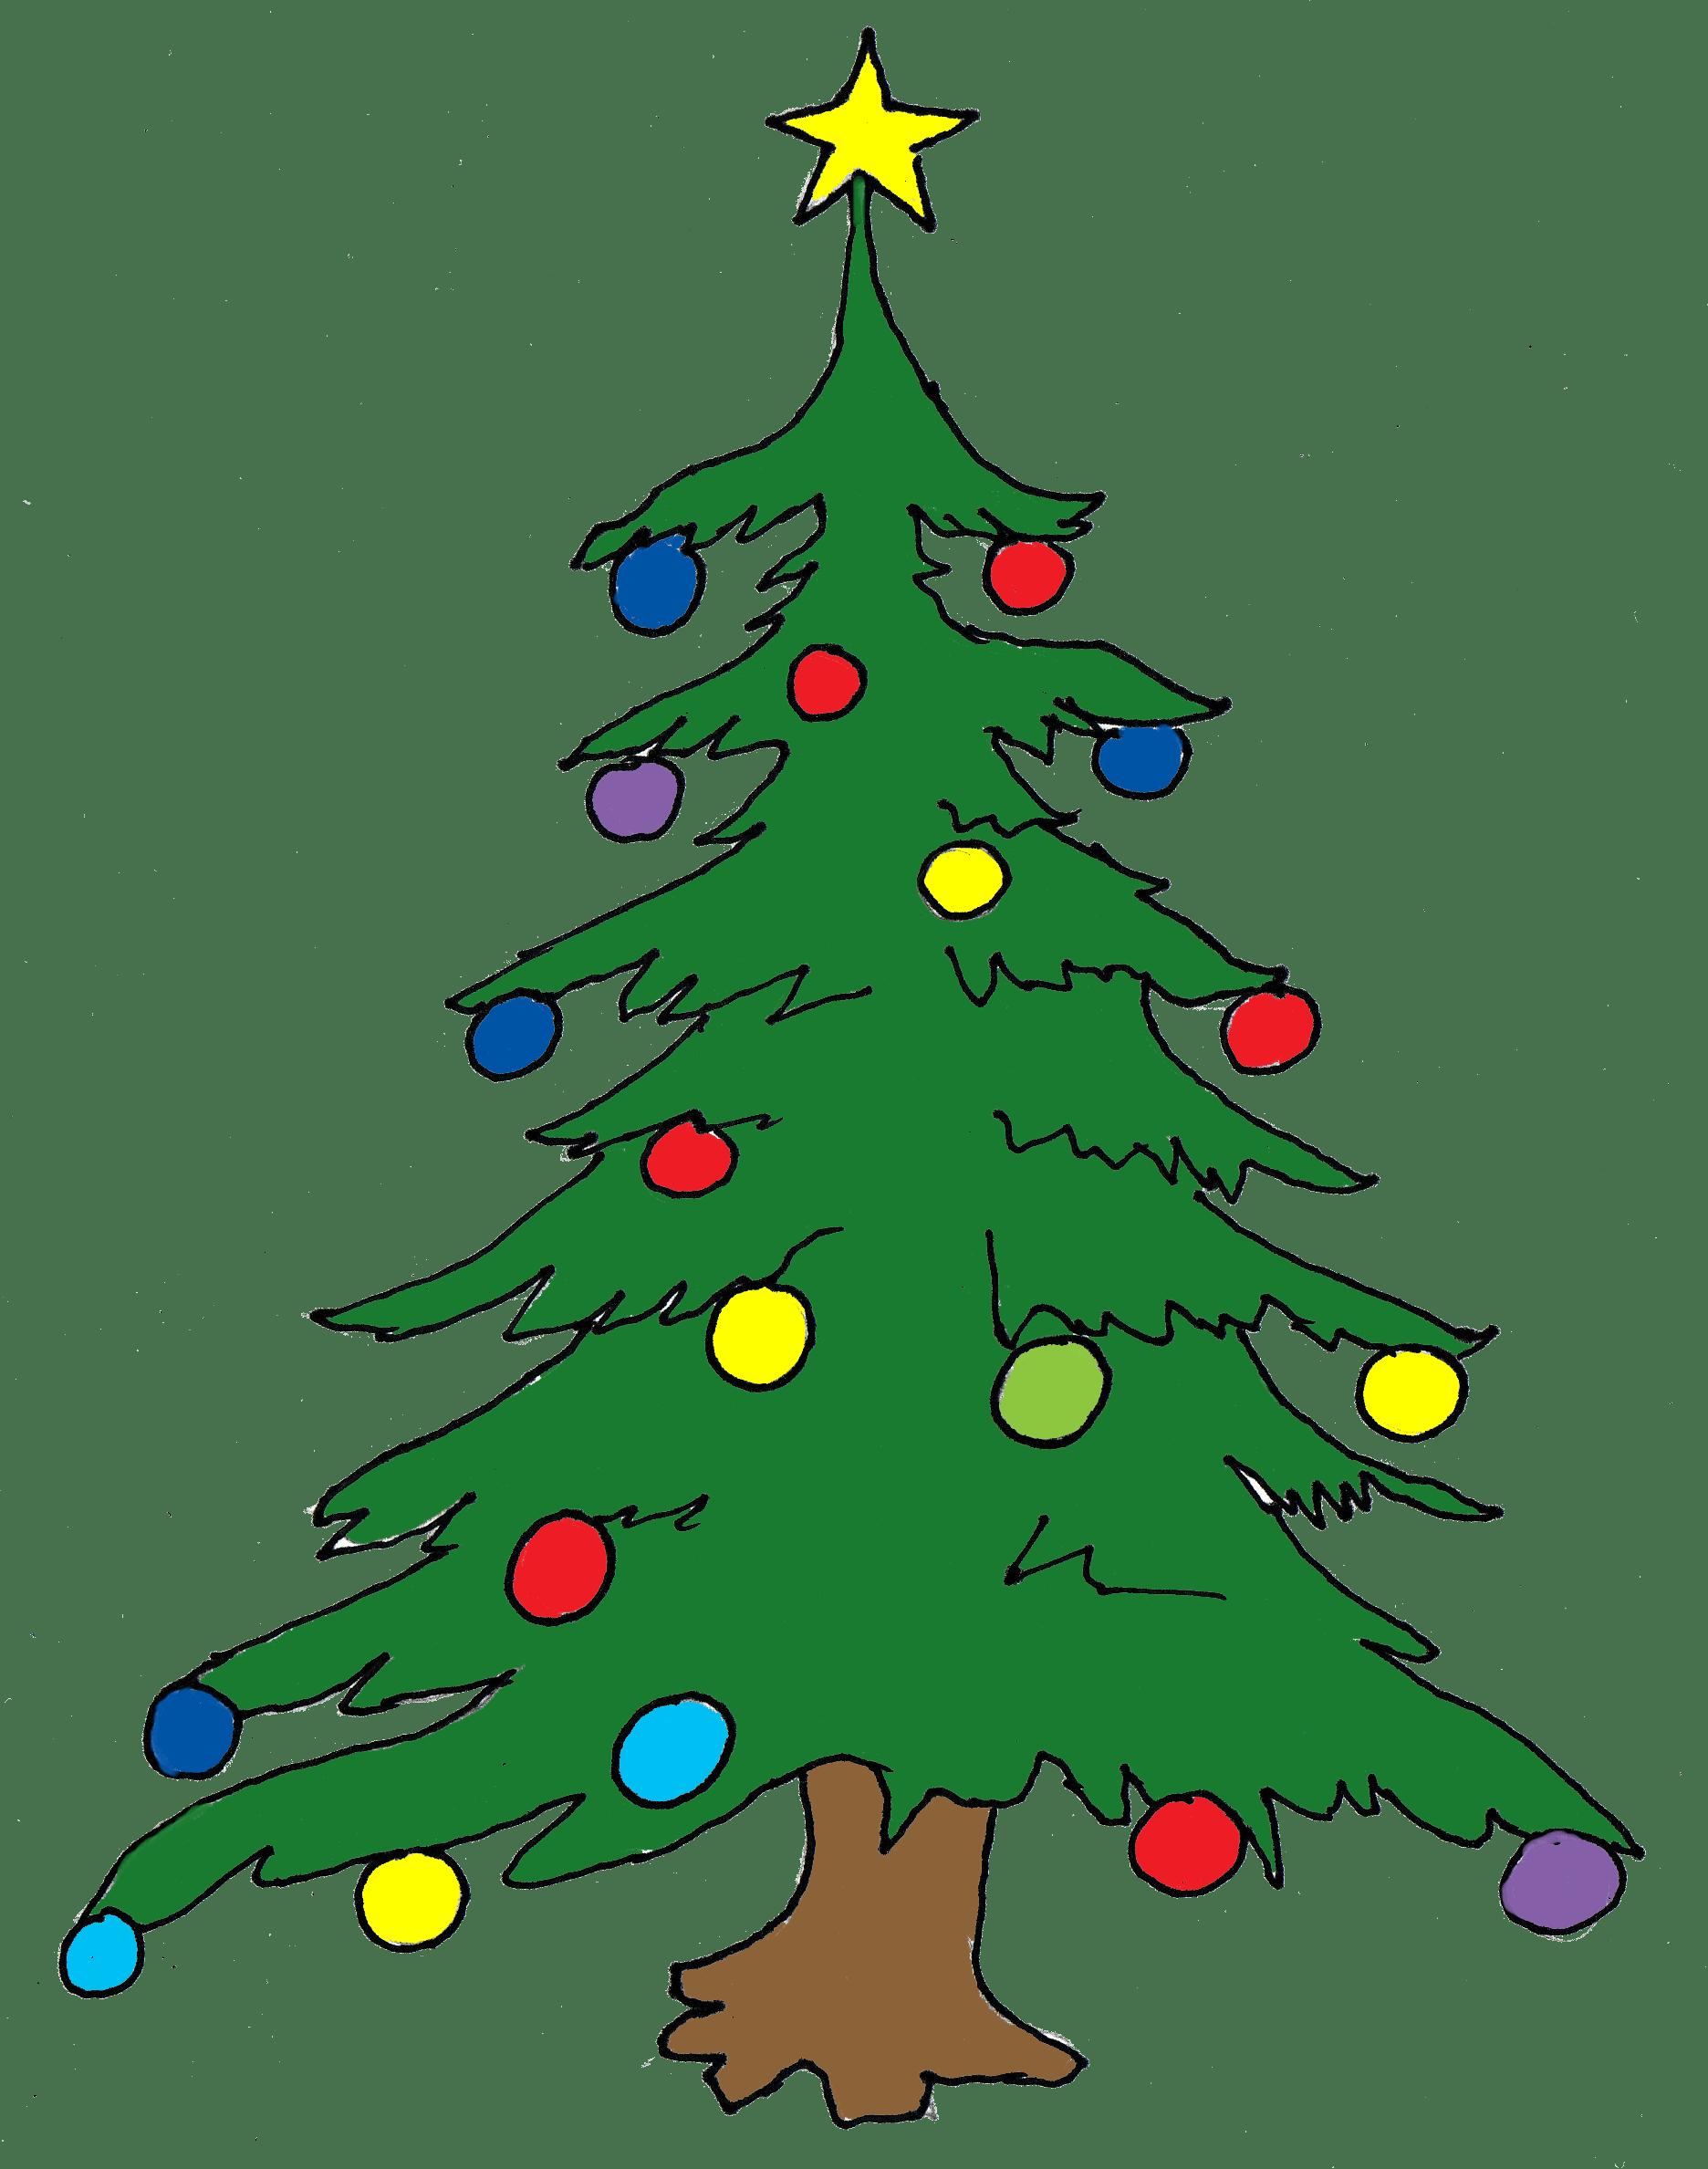 Tree lighting clipart jpg freeuse Christmas Tree Lighting Clipart - Real Clipart And Vector Graphics • jpg freeuse